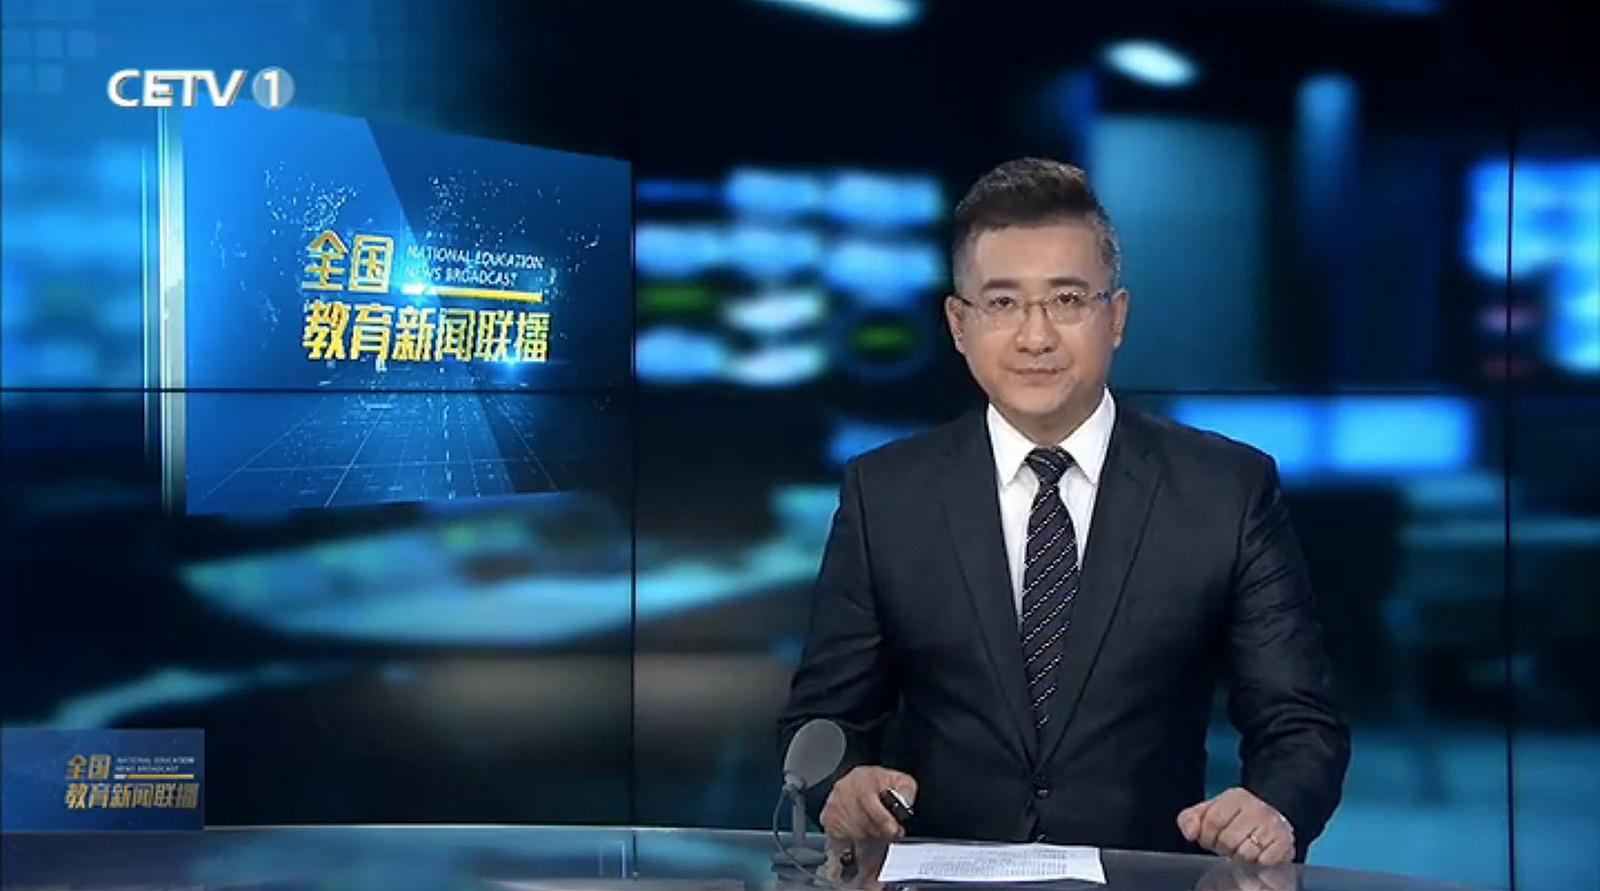 ncs_China-Education-Network-Television-Studio_0003